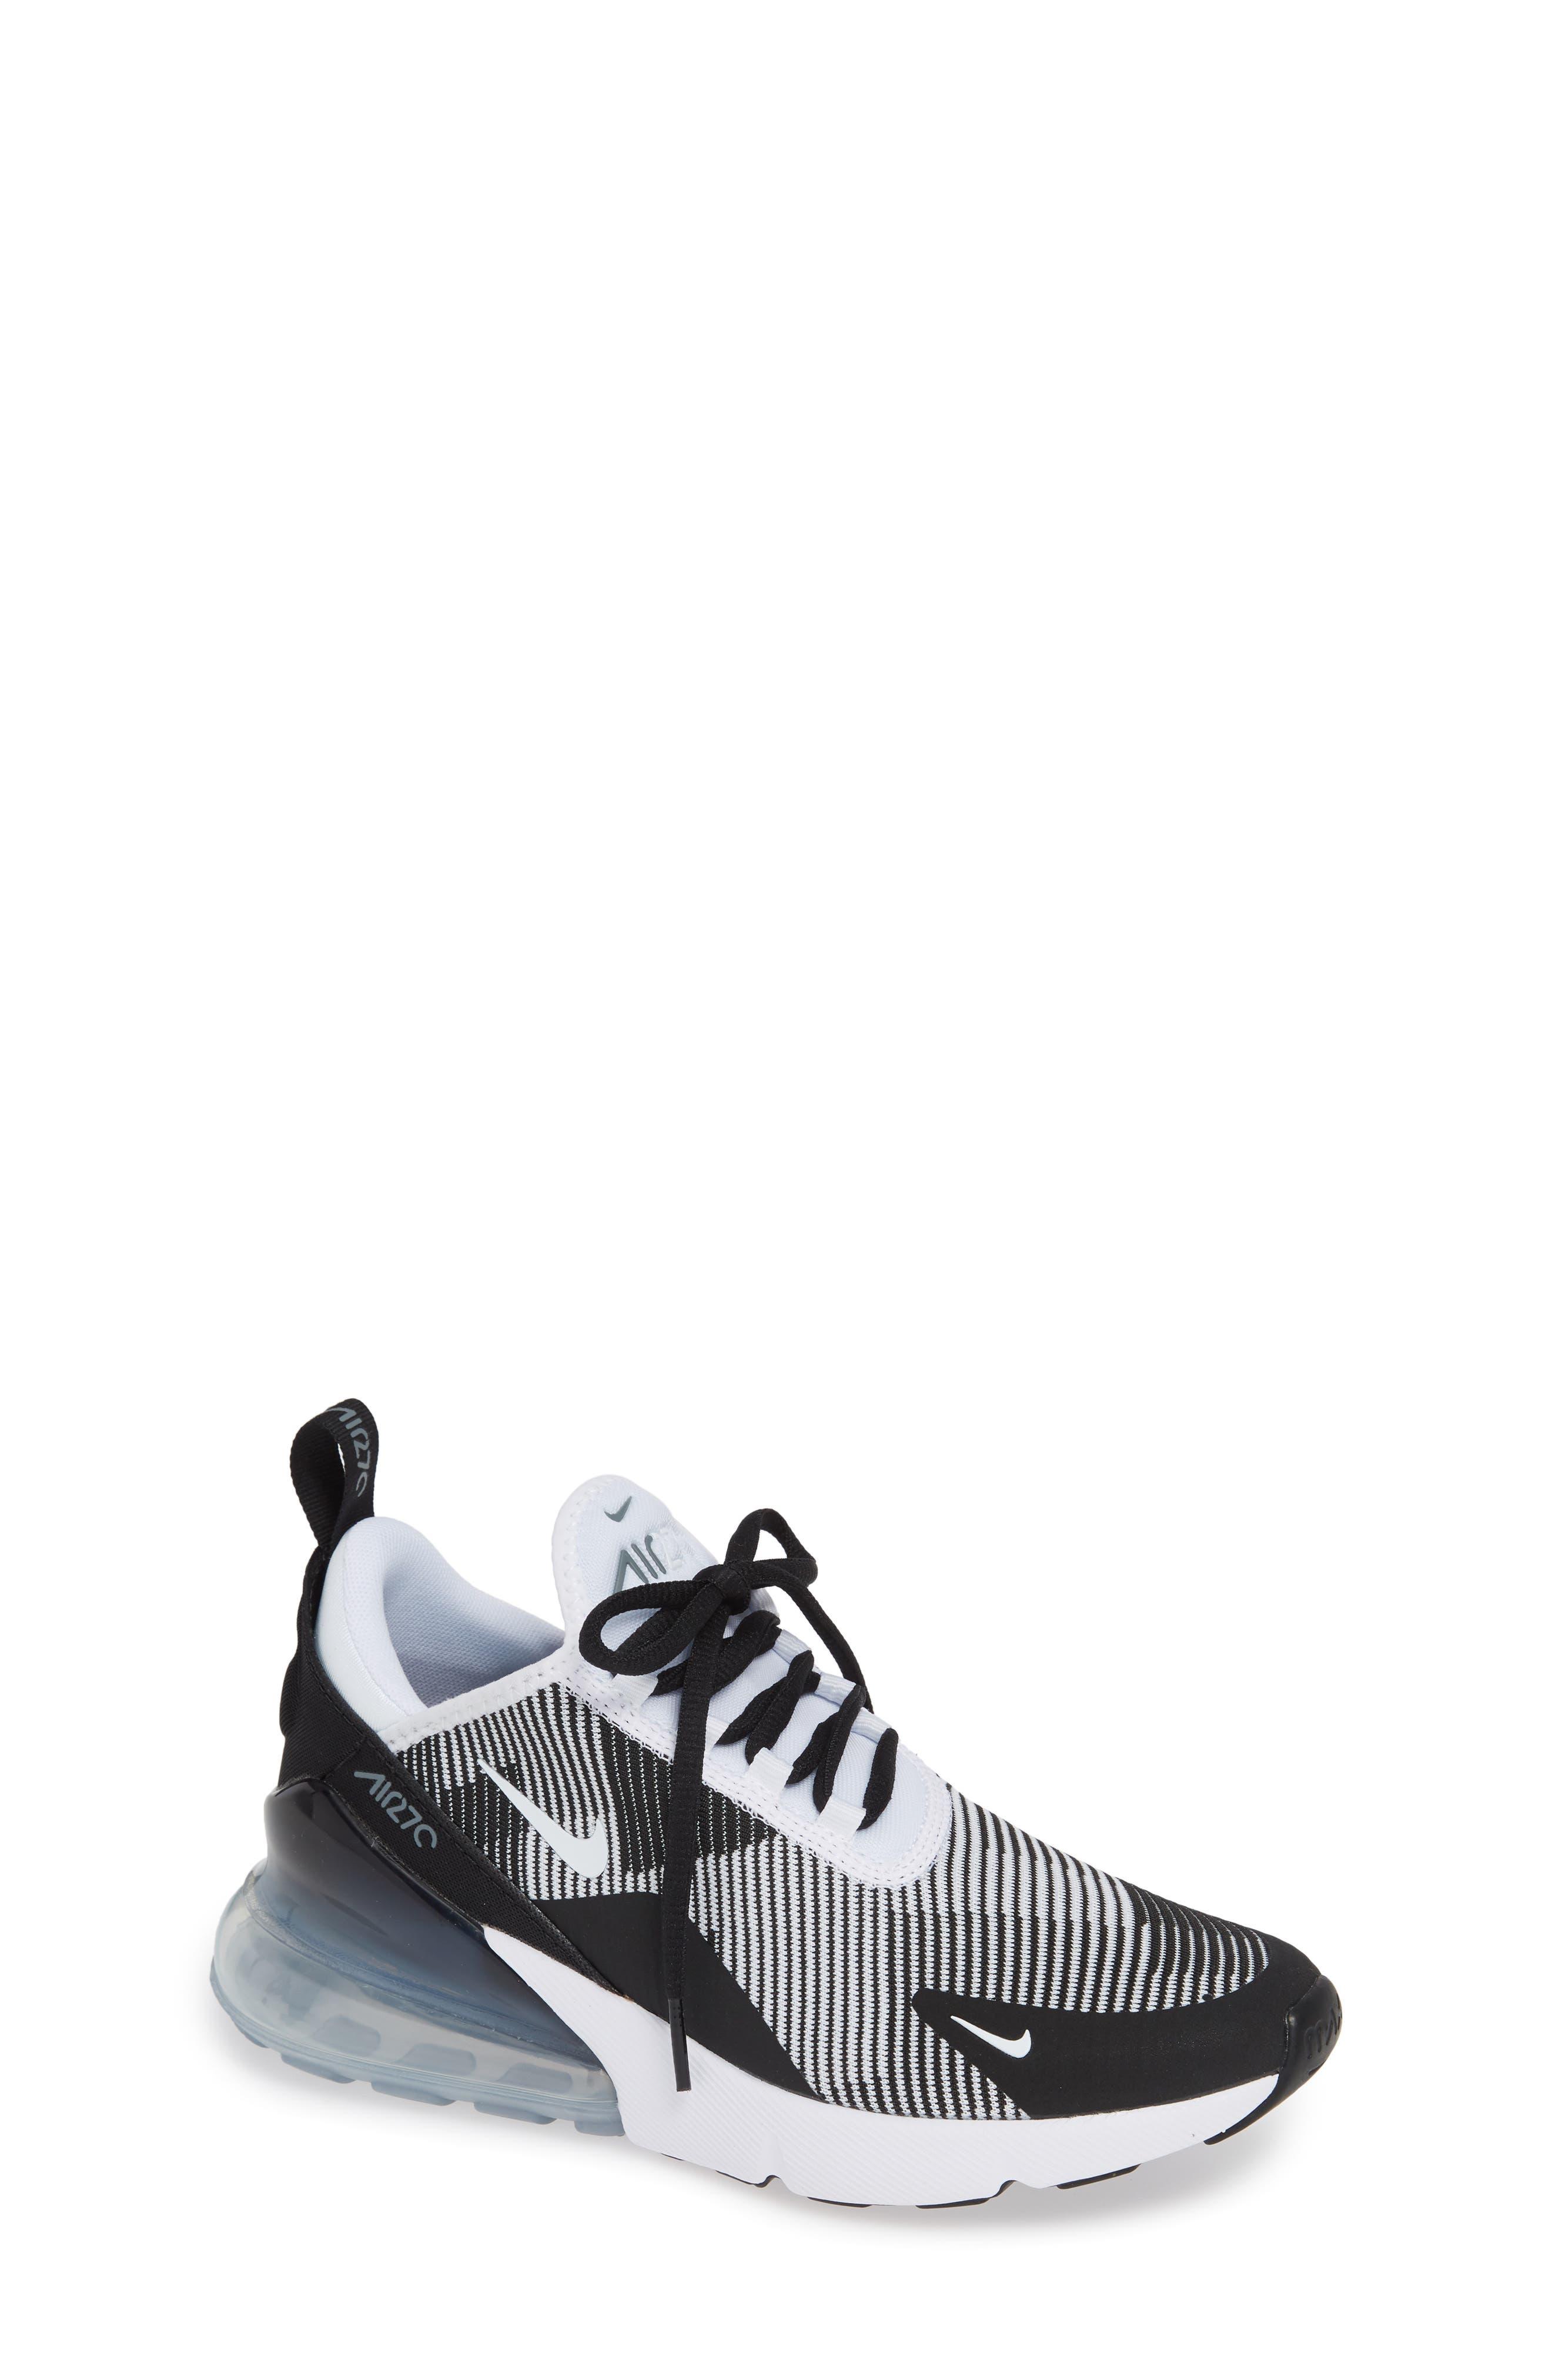 Air Max 270 Sneaker,                         Main,                         color, BLACK/ WHITE/ GREY/ SILVER